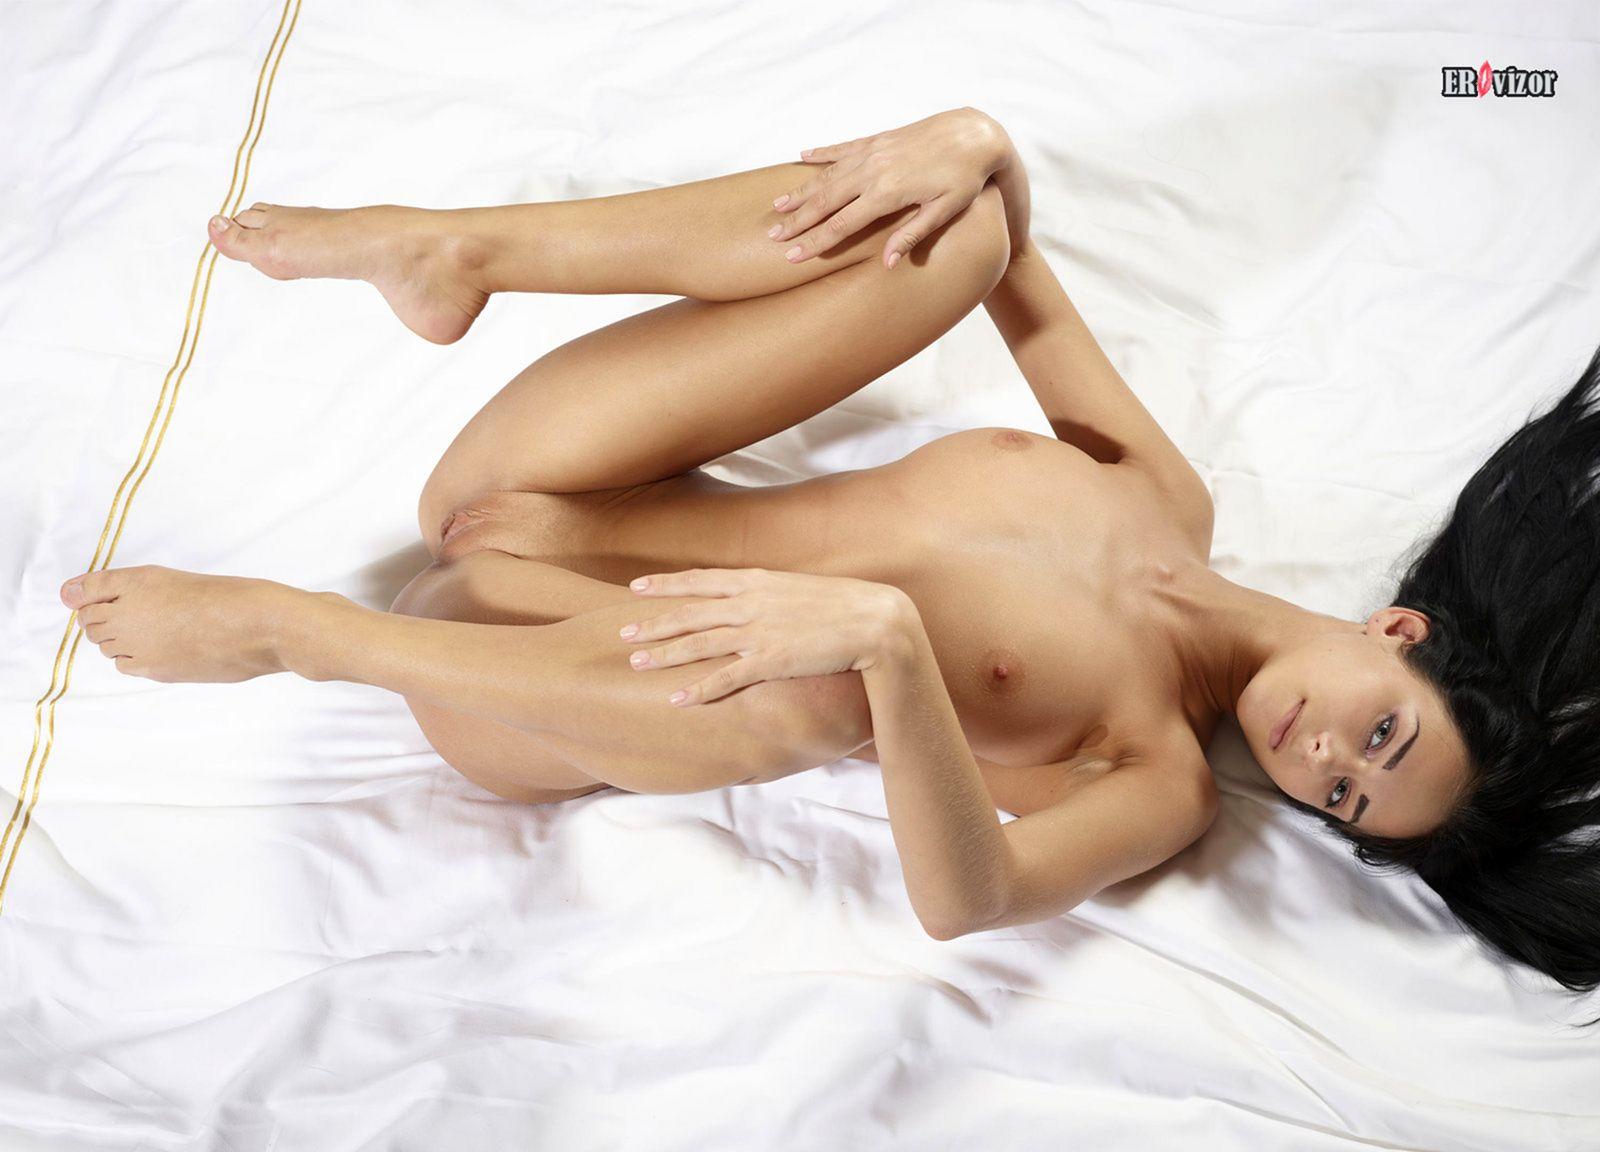 Rufina-eroticphoto (5)